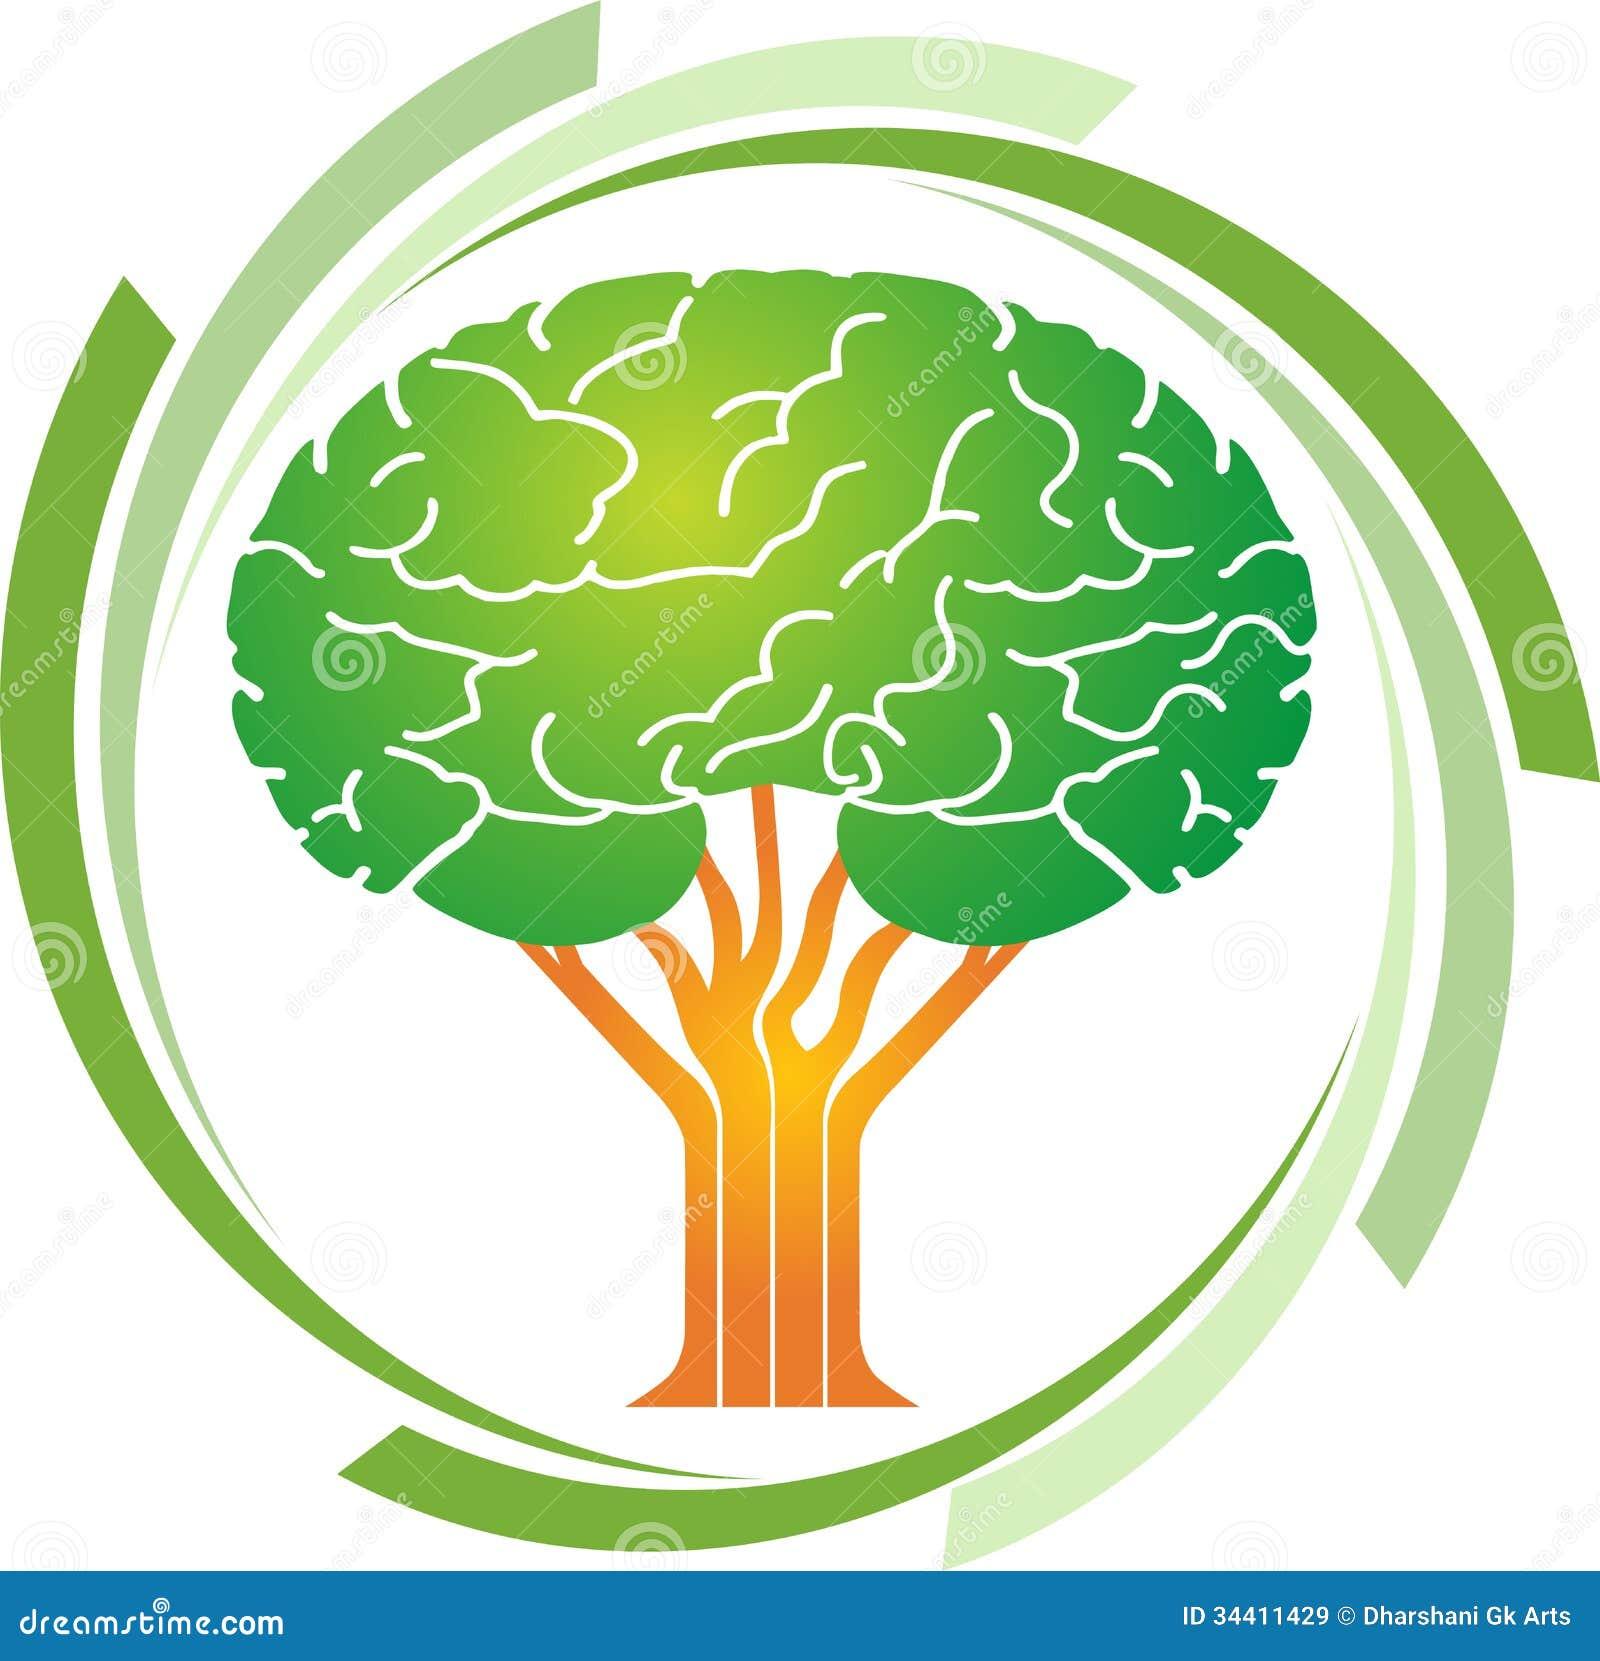 brain tree logo royalty free stock photos image 38414778